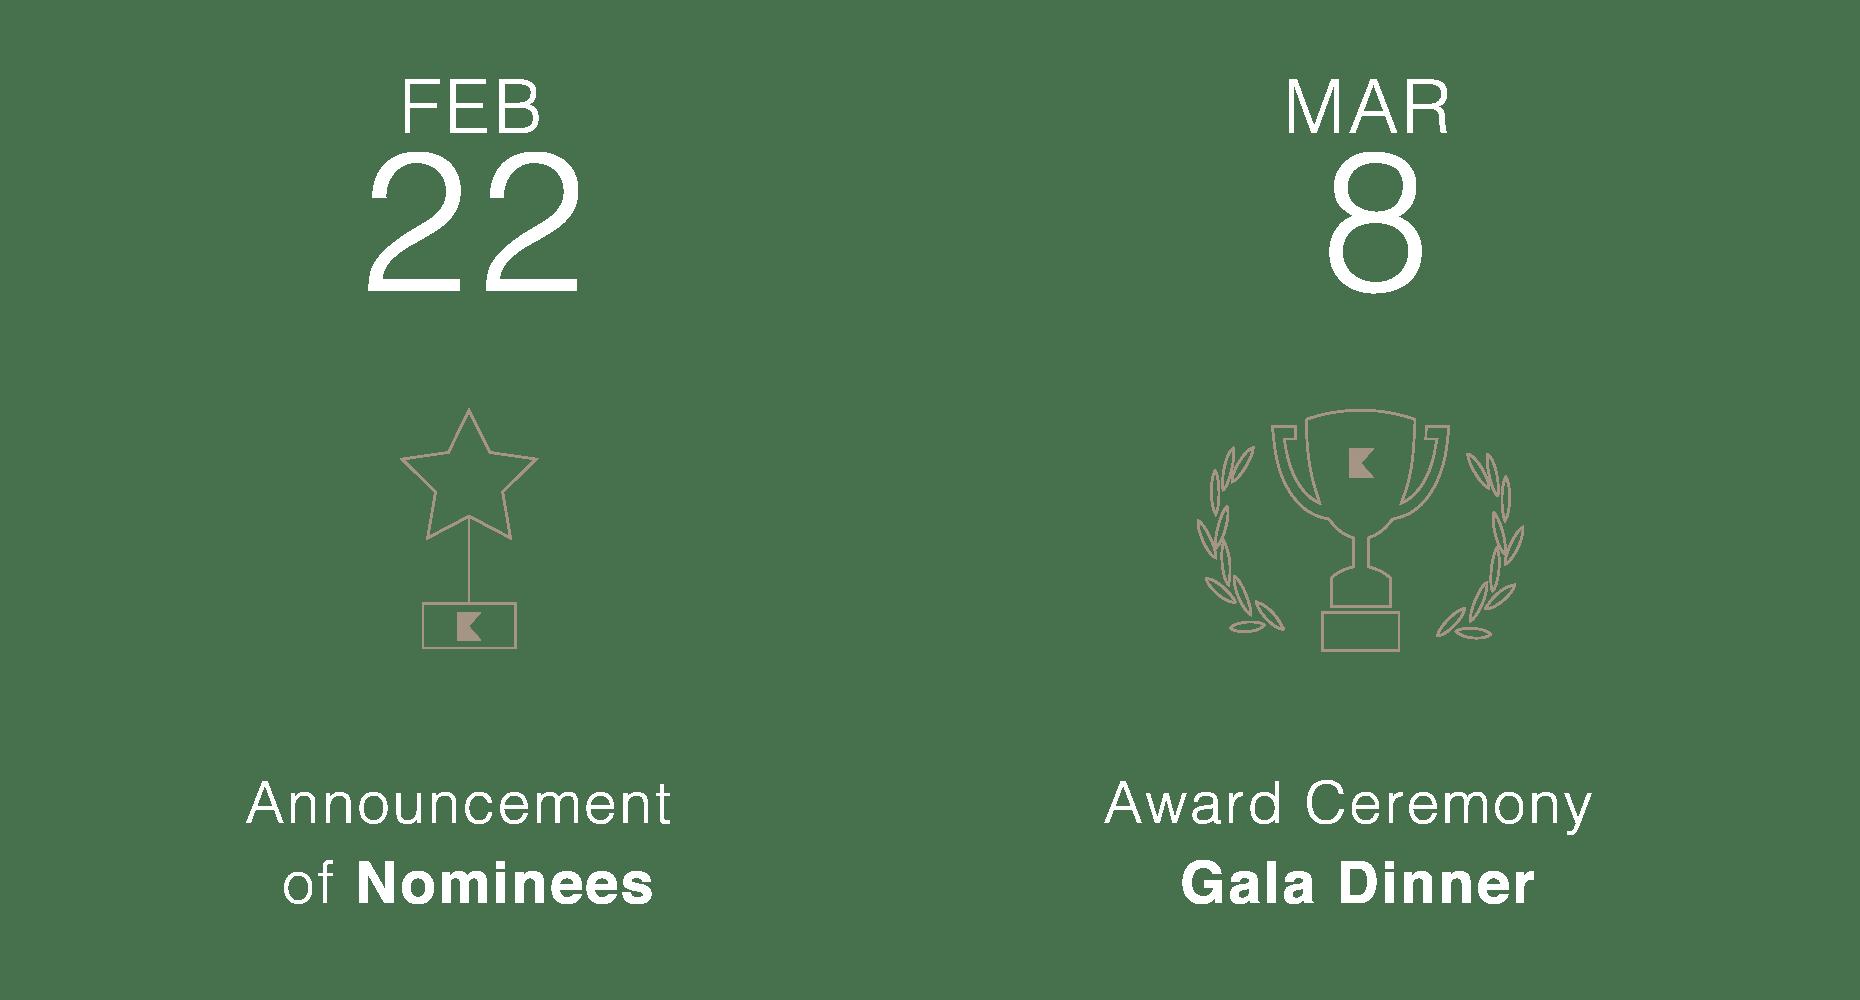 kohler-award-timeline